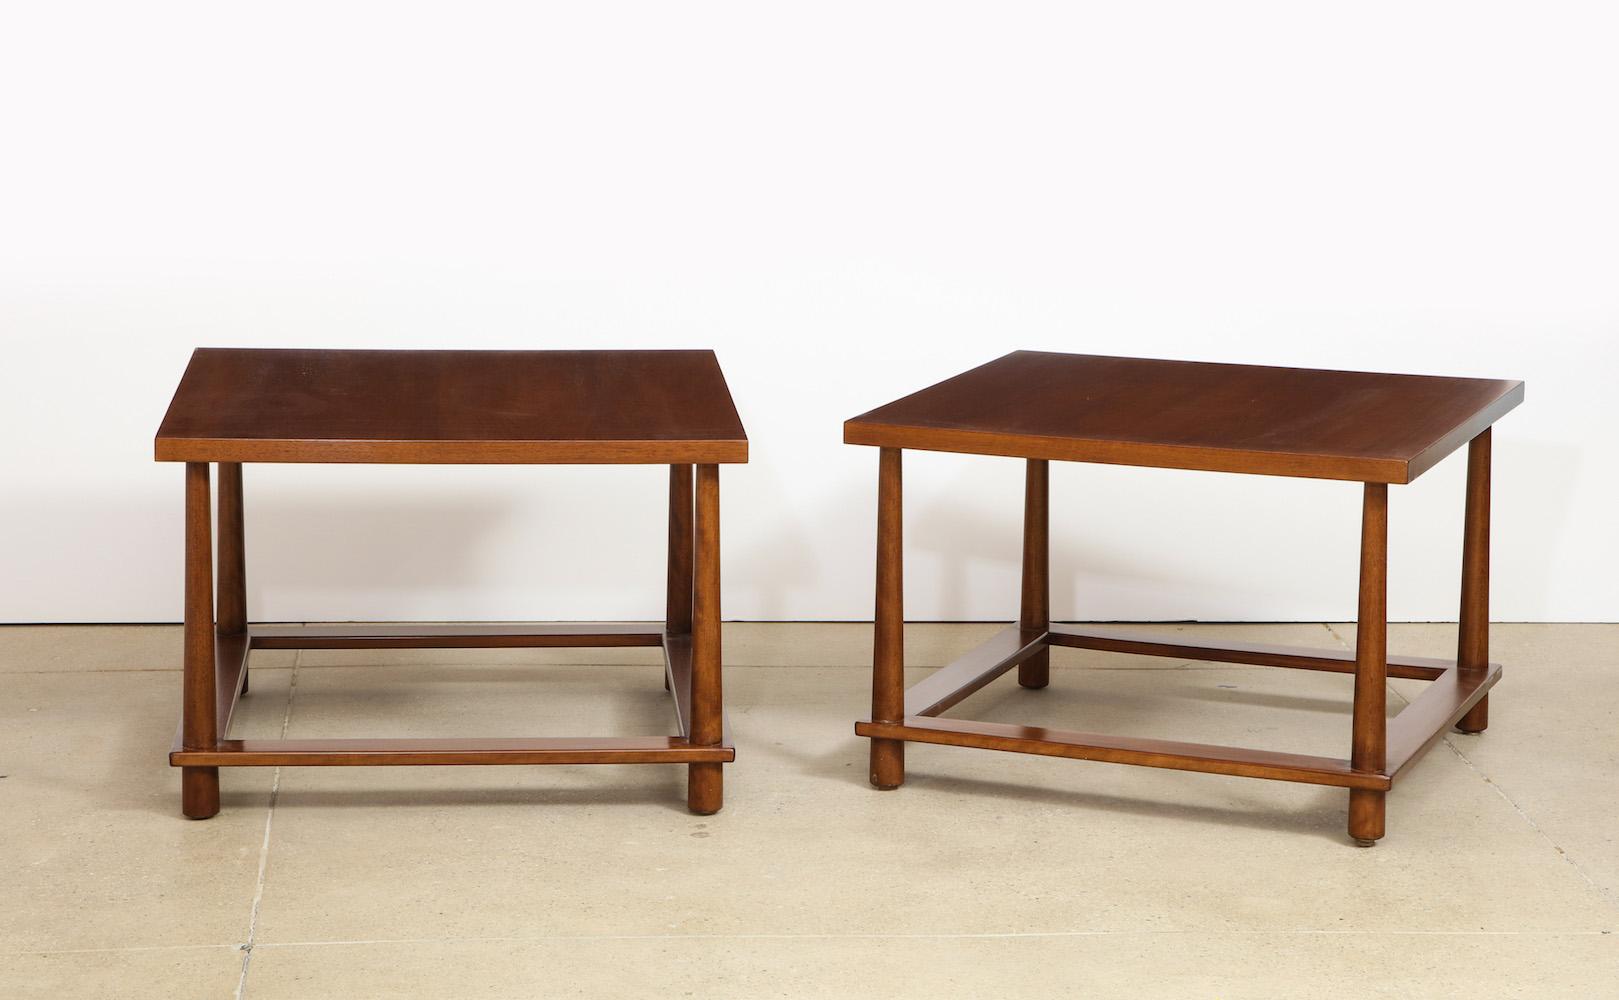 Gibbings big square tables 3.jpg